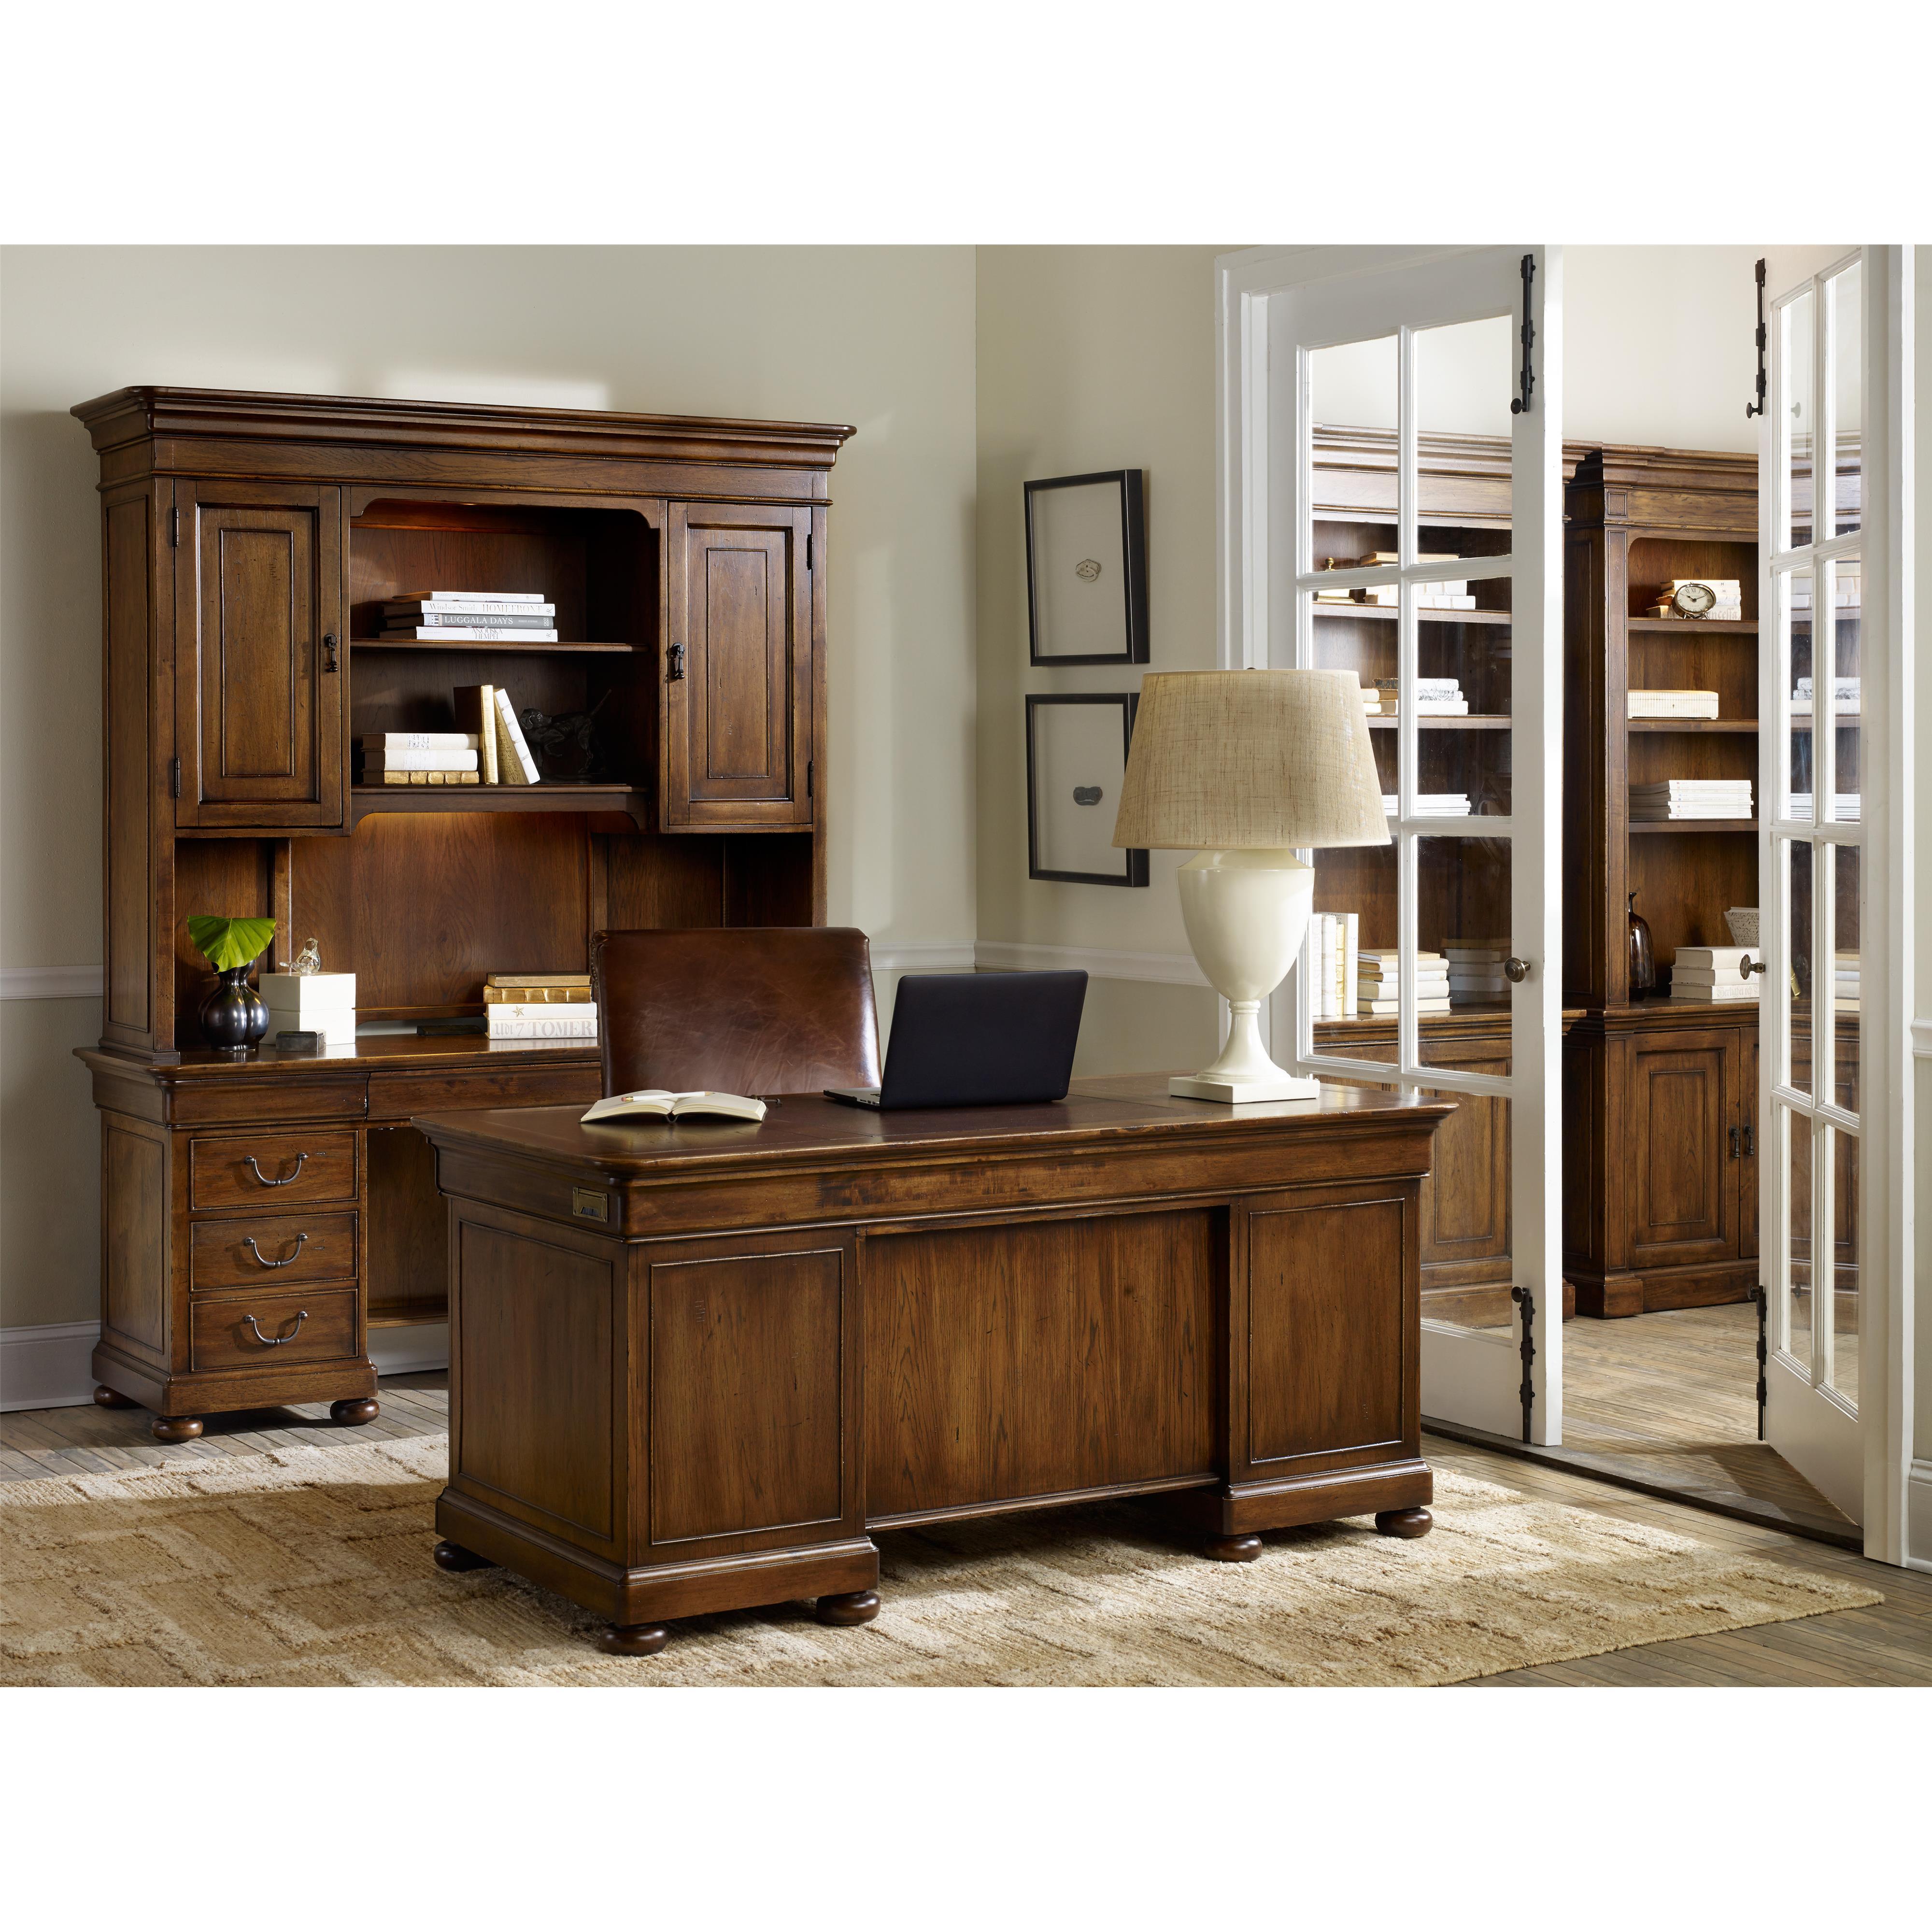 Hooker Furniture Archivist Executive Desk With 2 Locking